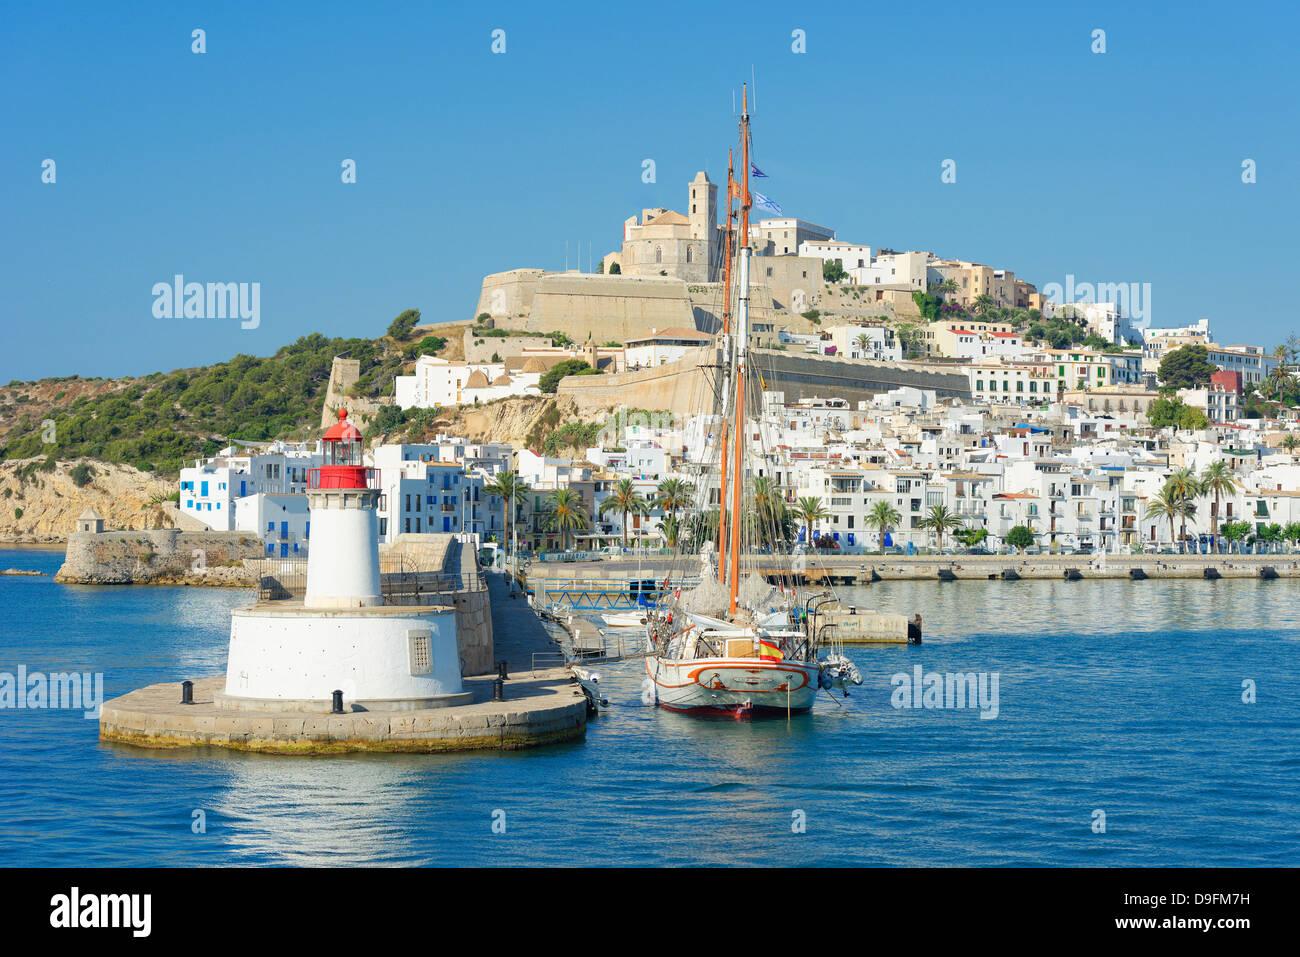 Ibiza old town and harbor, Ibiza, Balearic Islands, Spain, Mediterranean - Stock Image